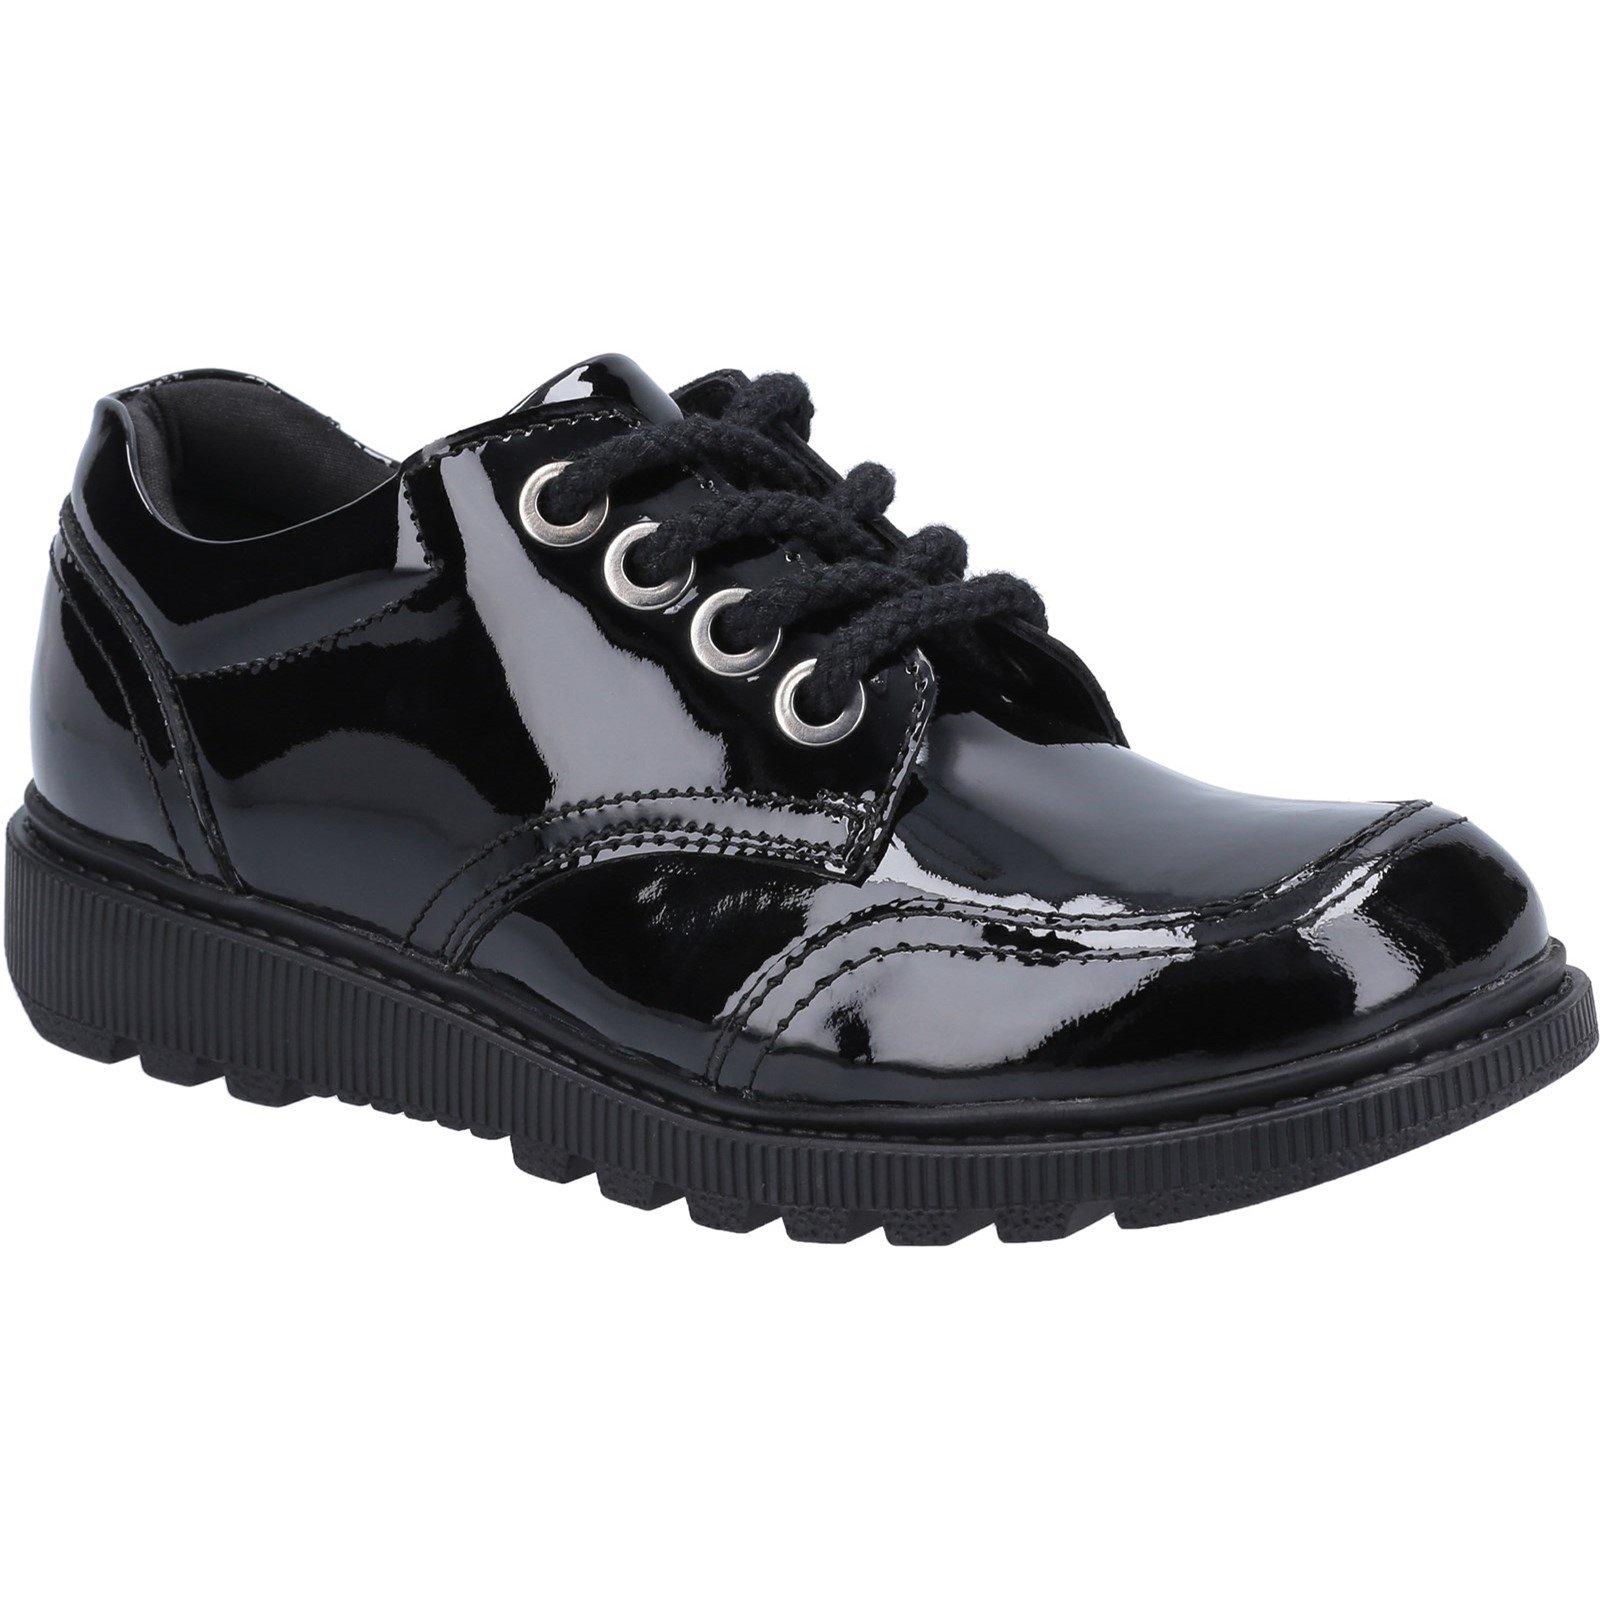 Hush Puppies Kid's Kiera Senior Patent School Shoe Black 30824 - Patent Black 7